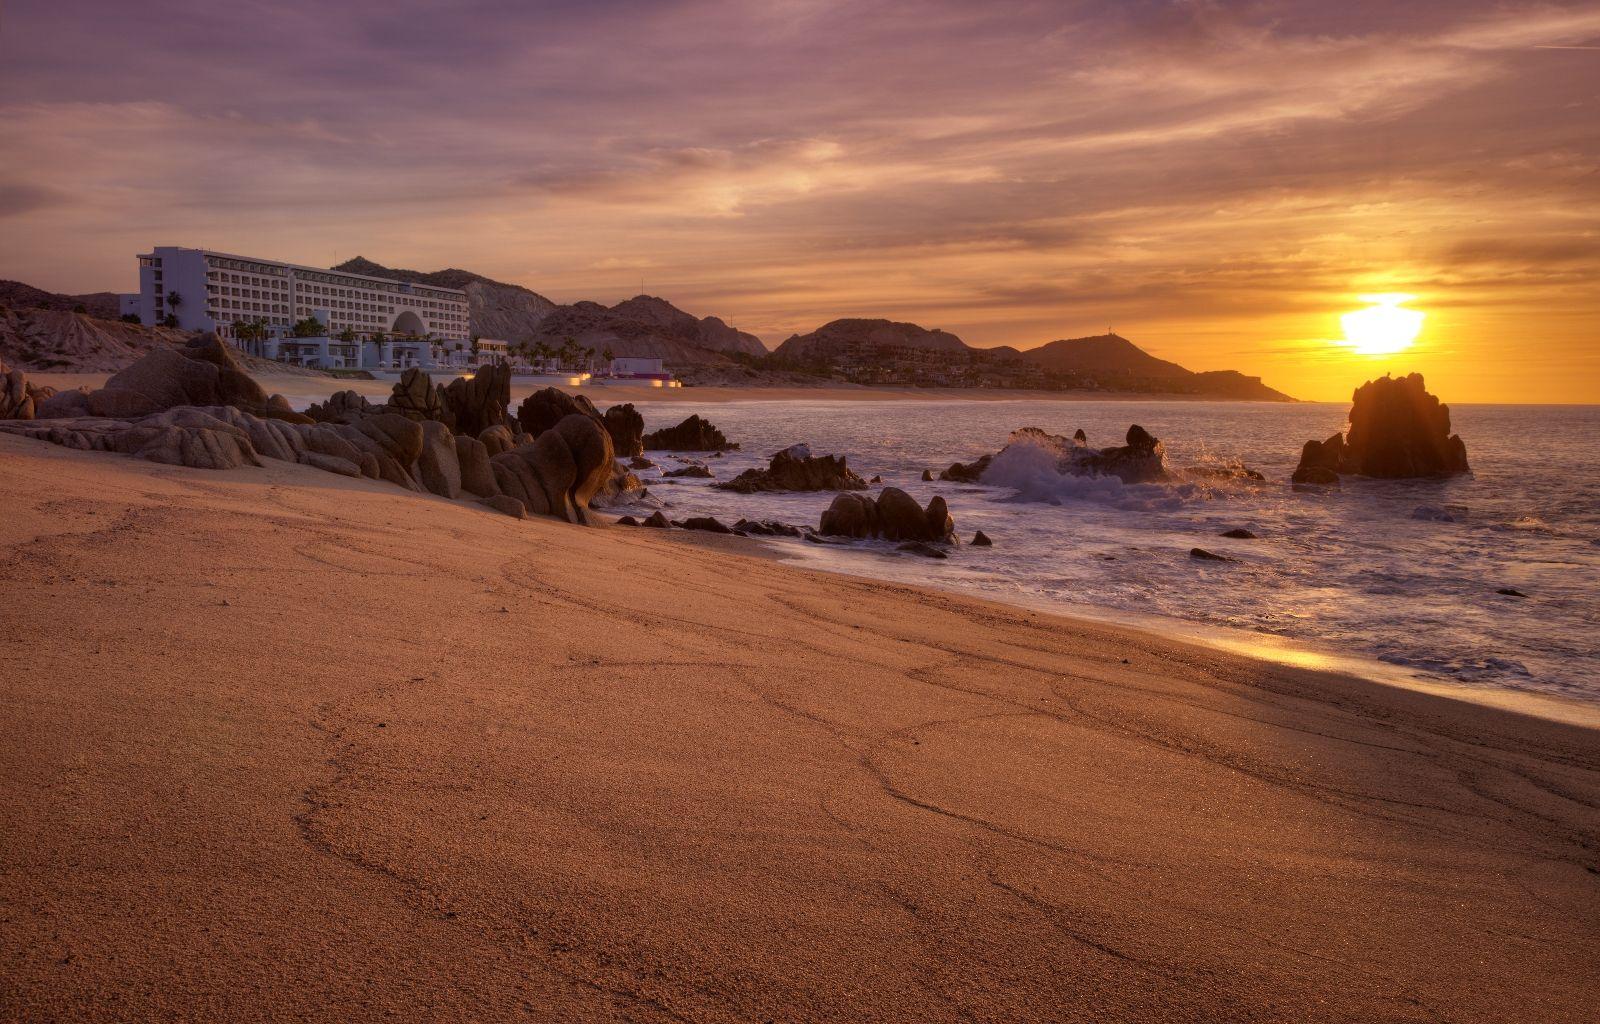 rocks in an ocean by a sandy beach